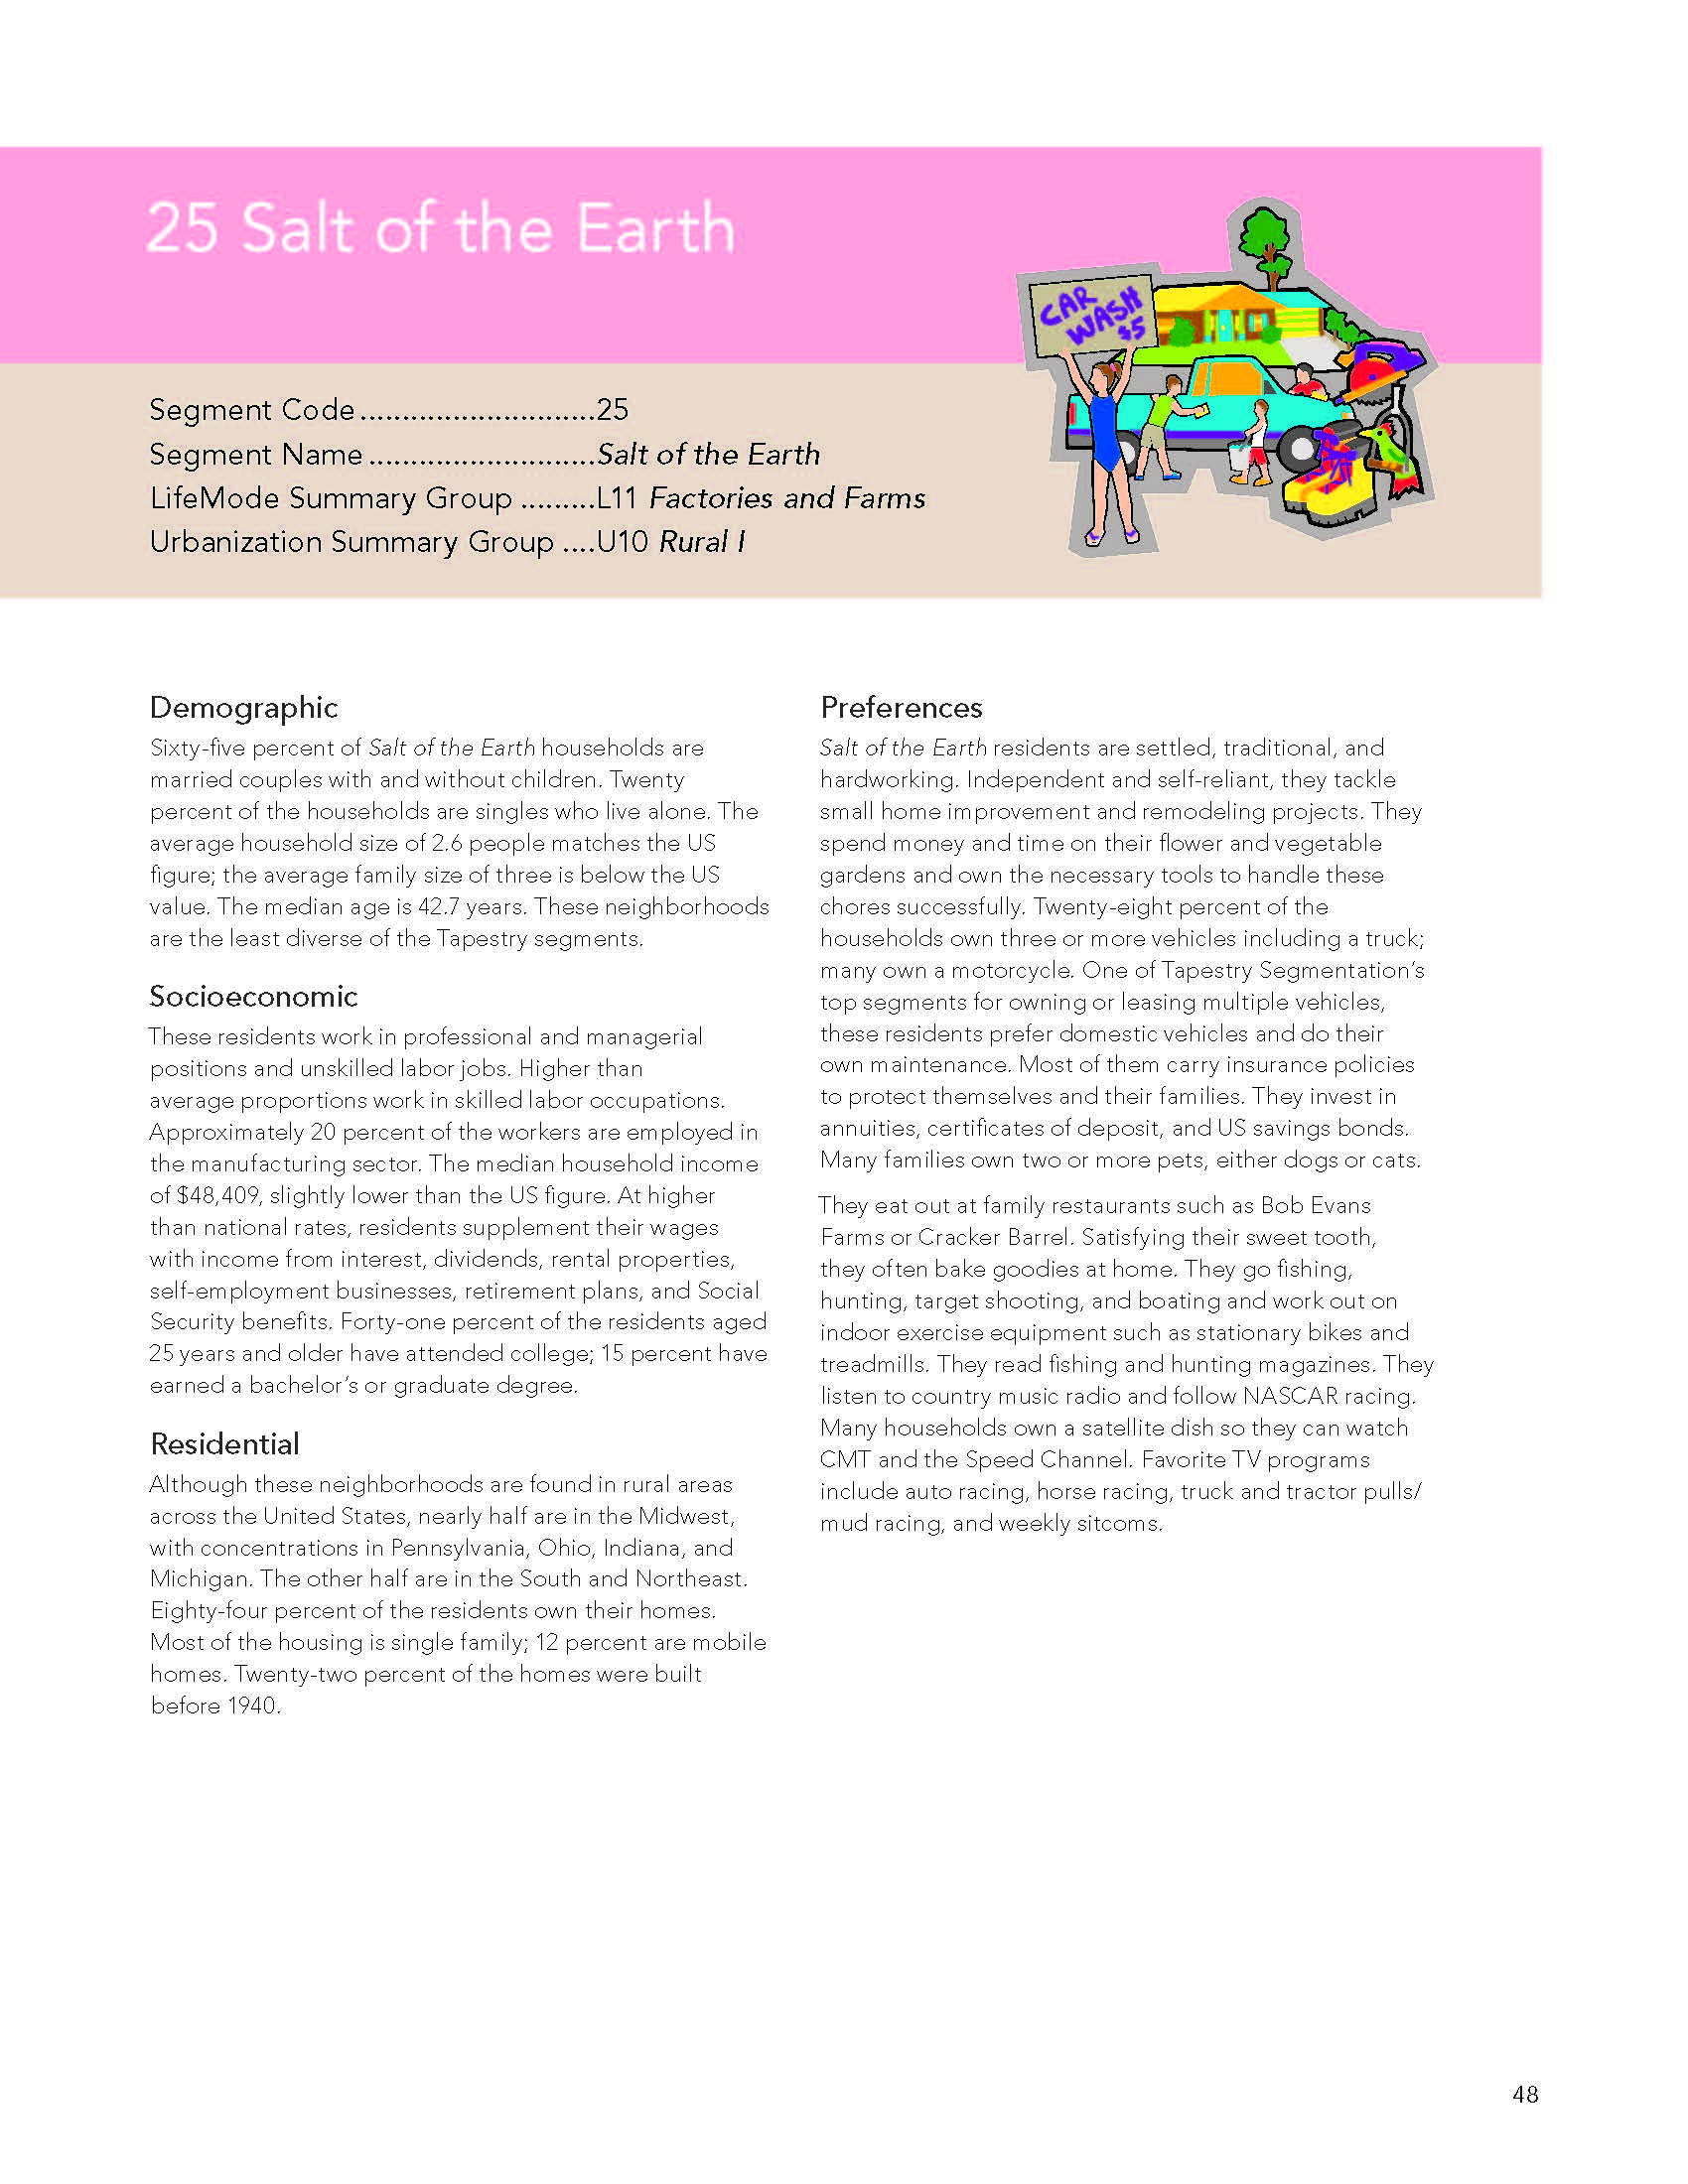 tapestry-segmentation_Page_51.jpg